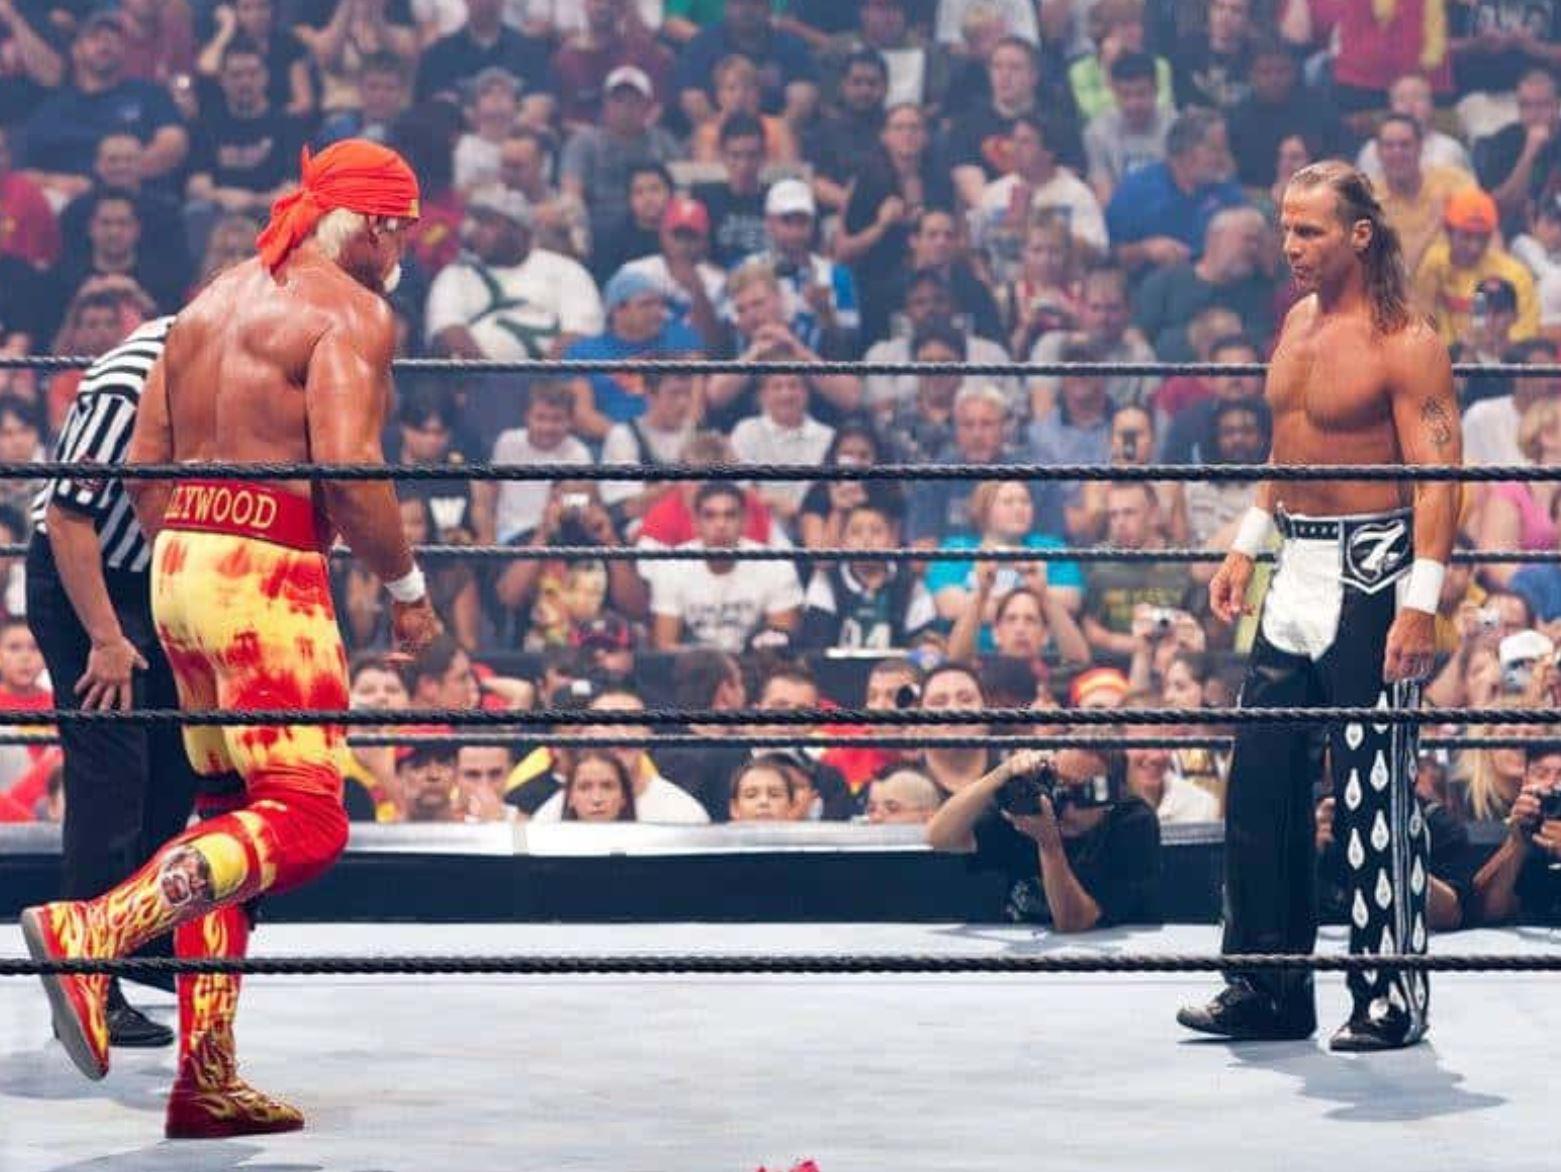 Hulk Hogan vs. Shawn Michaels at SummerSlam